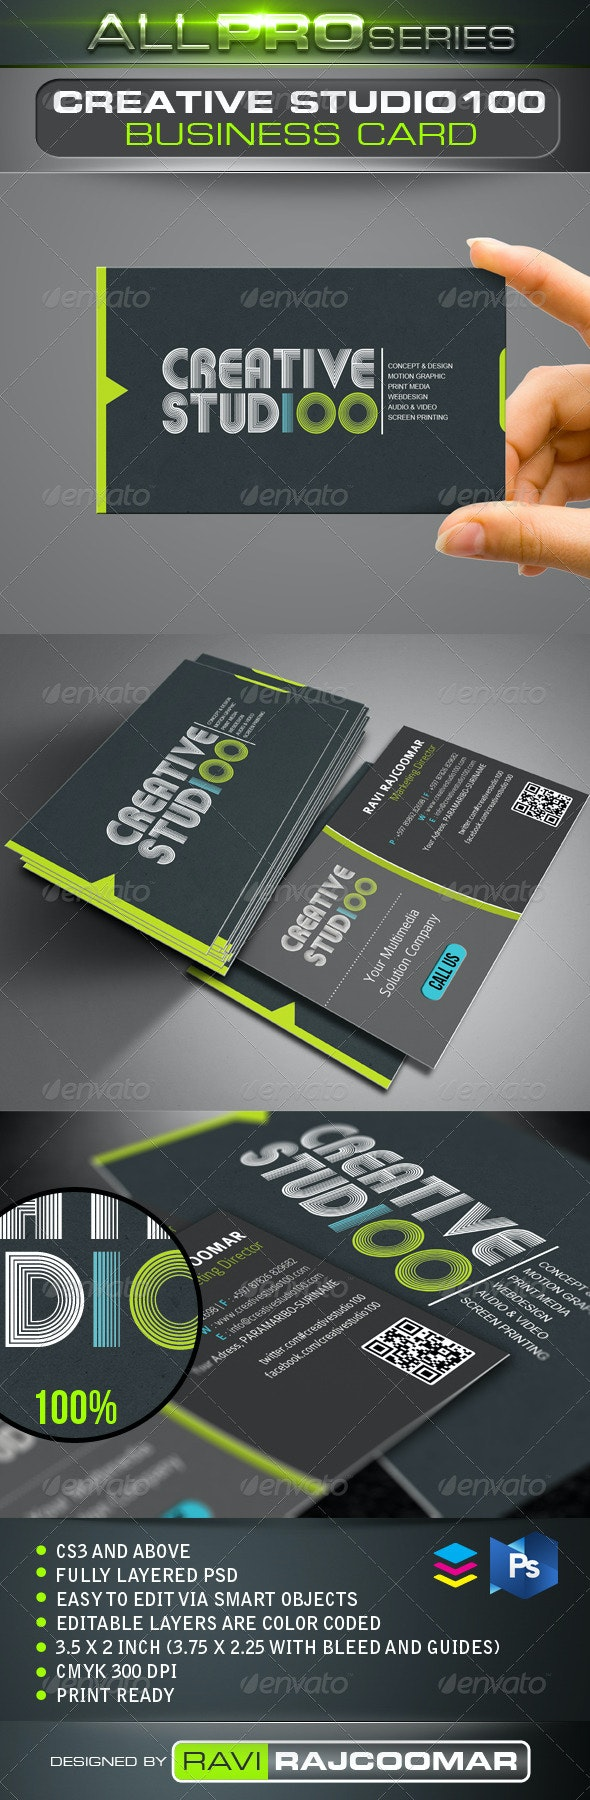 Creative Studio100 Business Card - Creative Business Cards